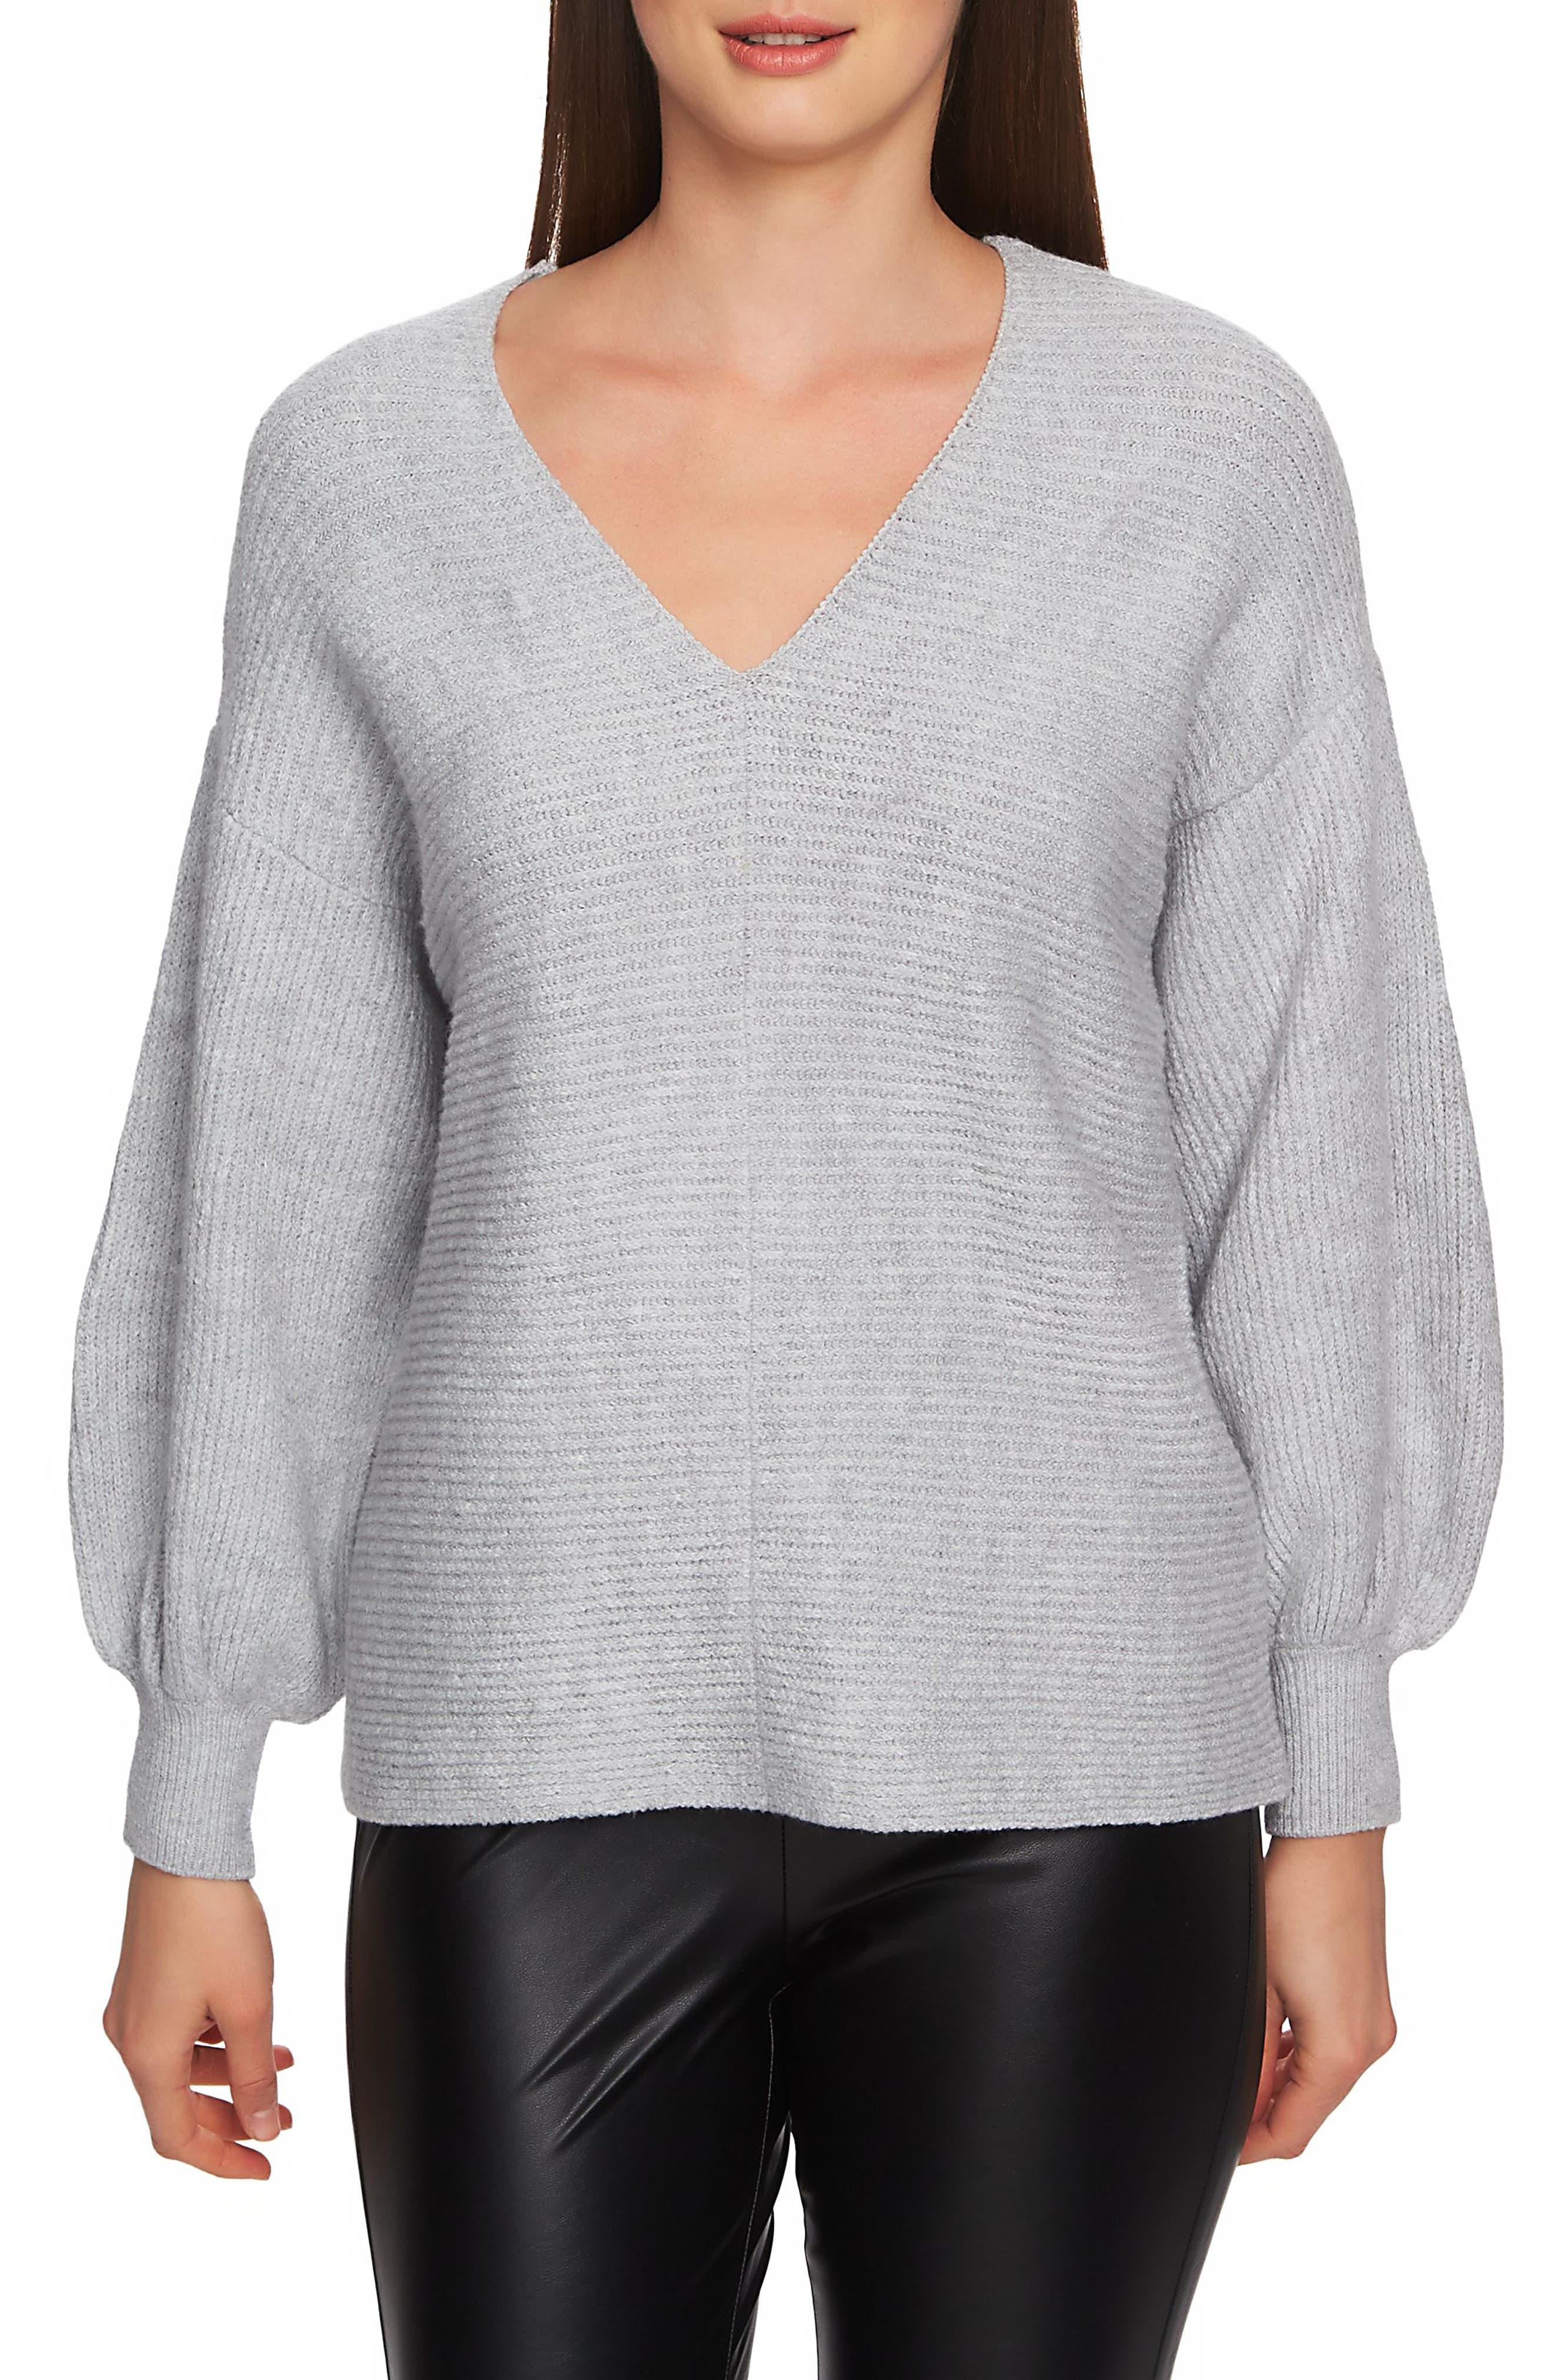 Blouson Sleeve V-Neck Sweater,                             Main thumbnail 1, color,                             LIGHT HEATHER GREY